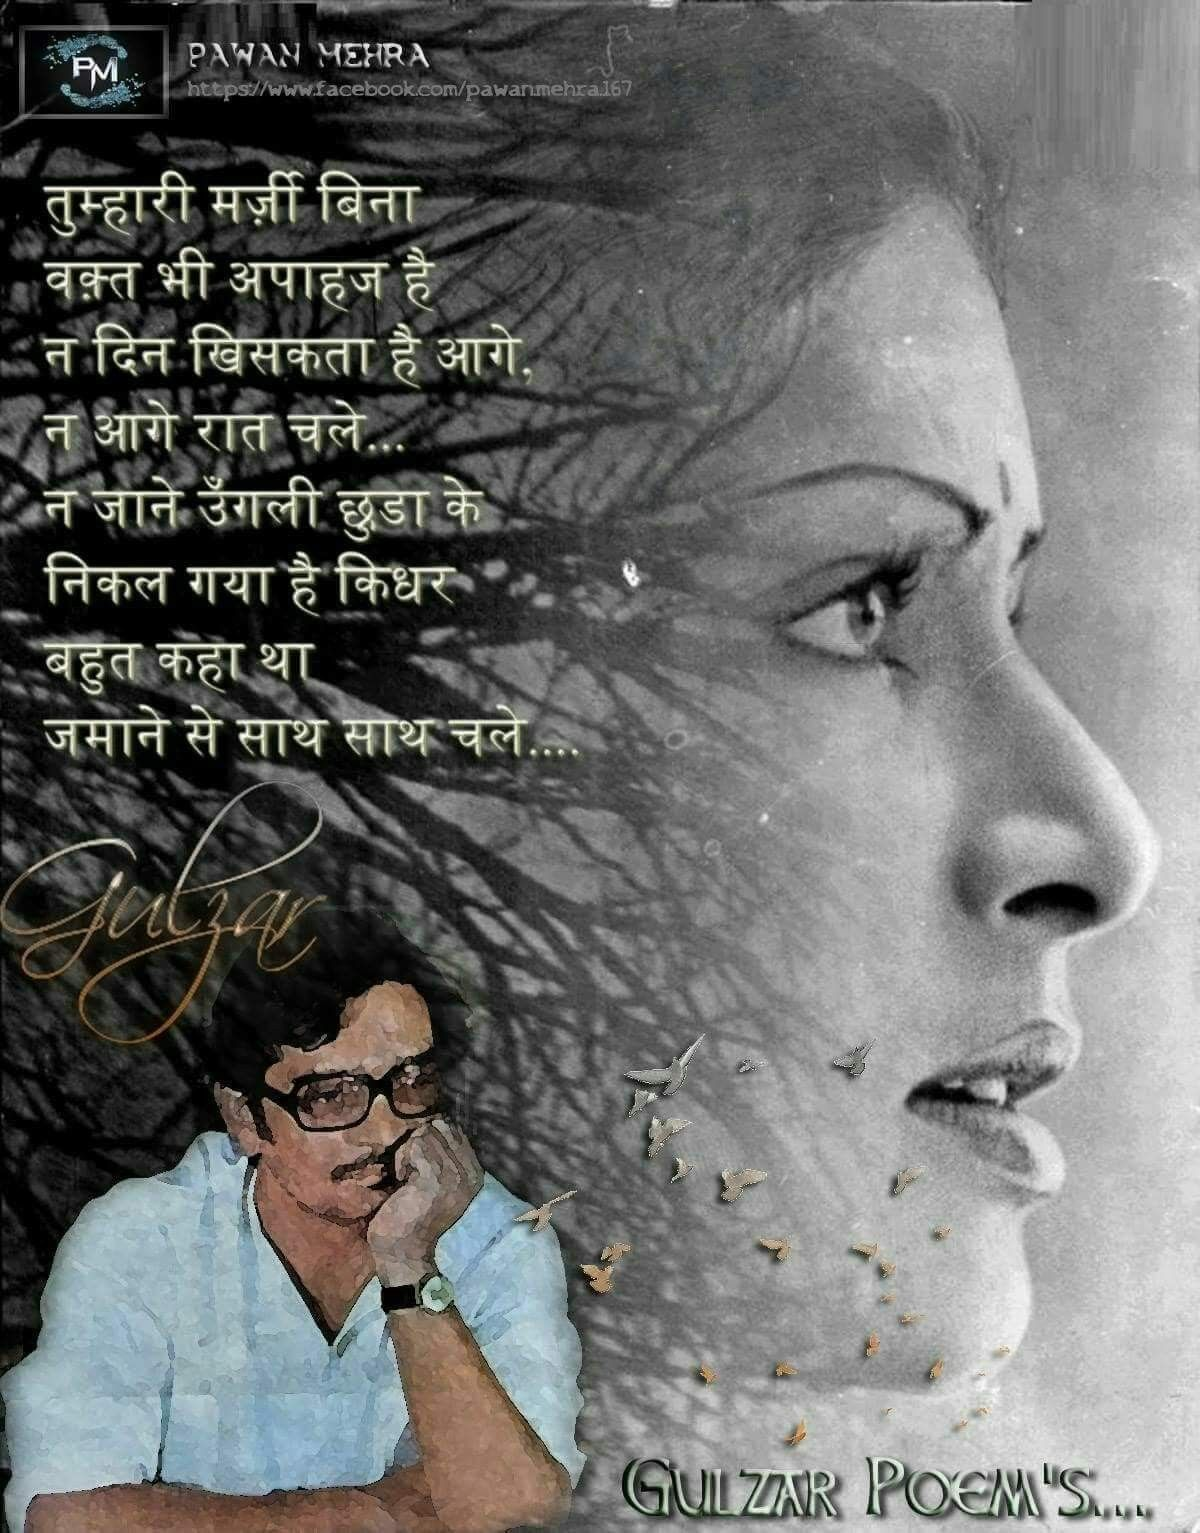 Pin by Rajiv Kumar on tu hi diwangi Birthday wishes for